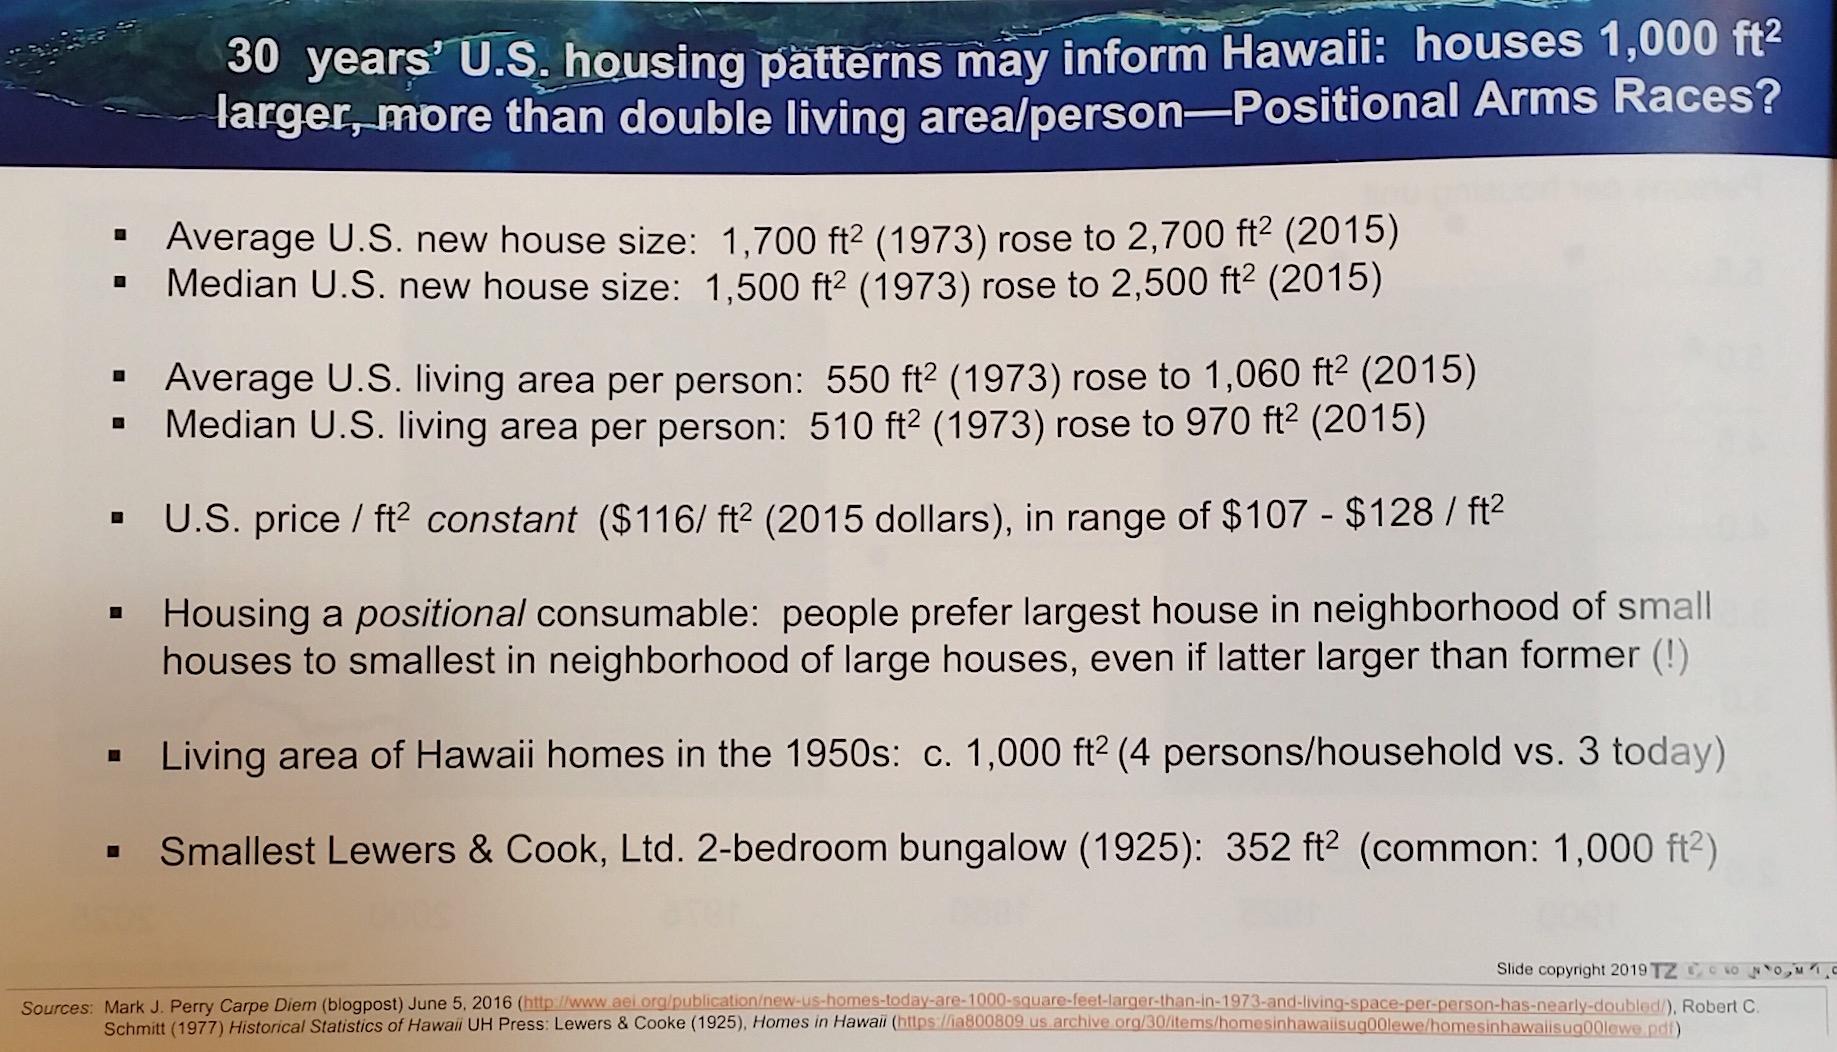 Honolulu Housing: The Last Century by Paul Brewbaker